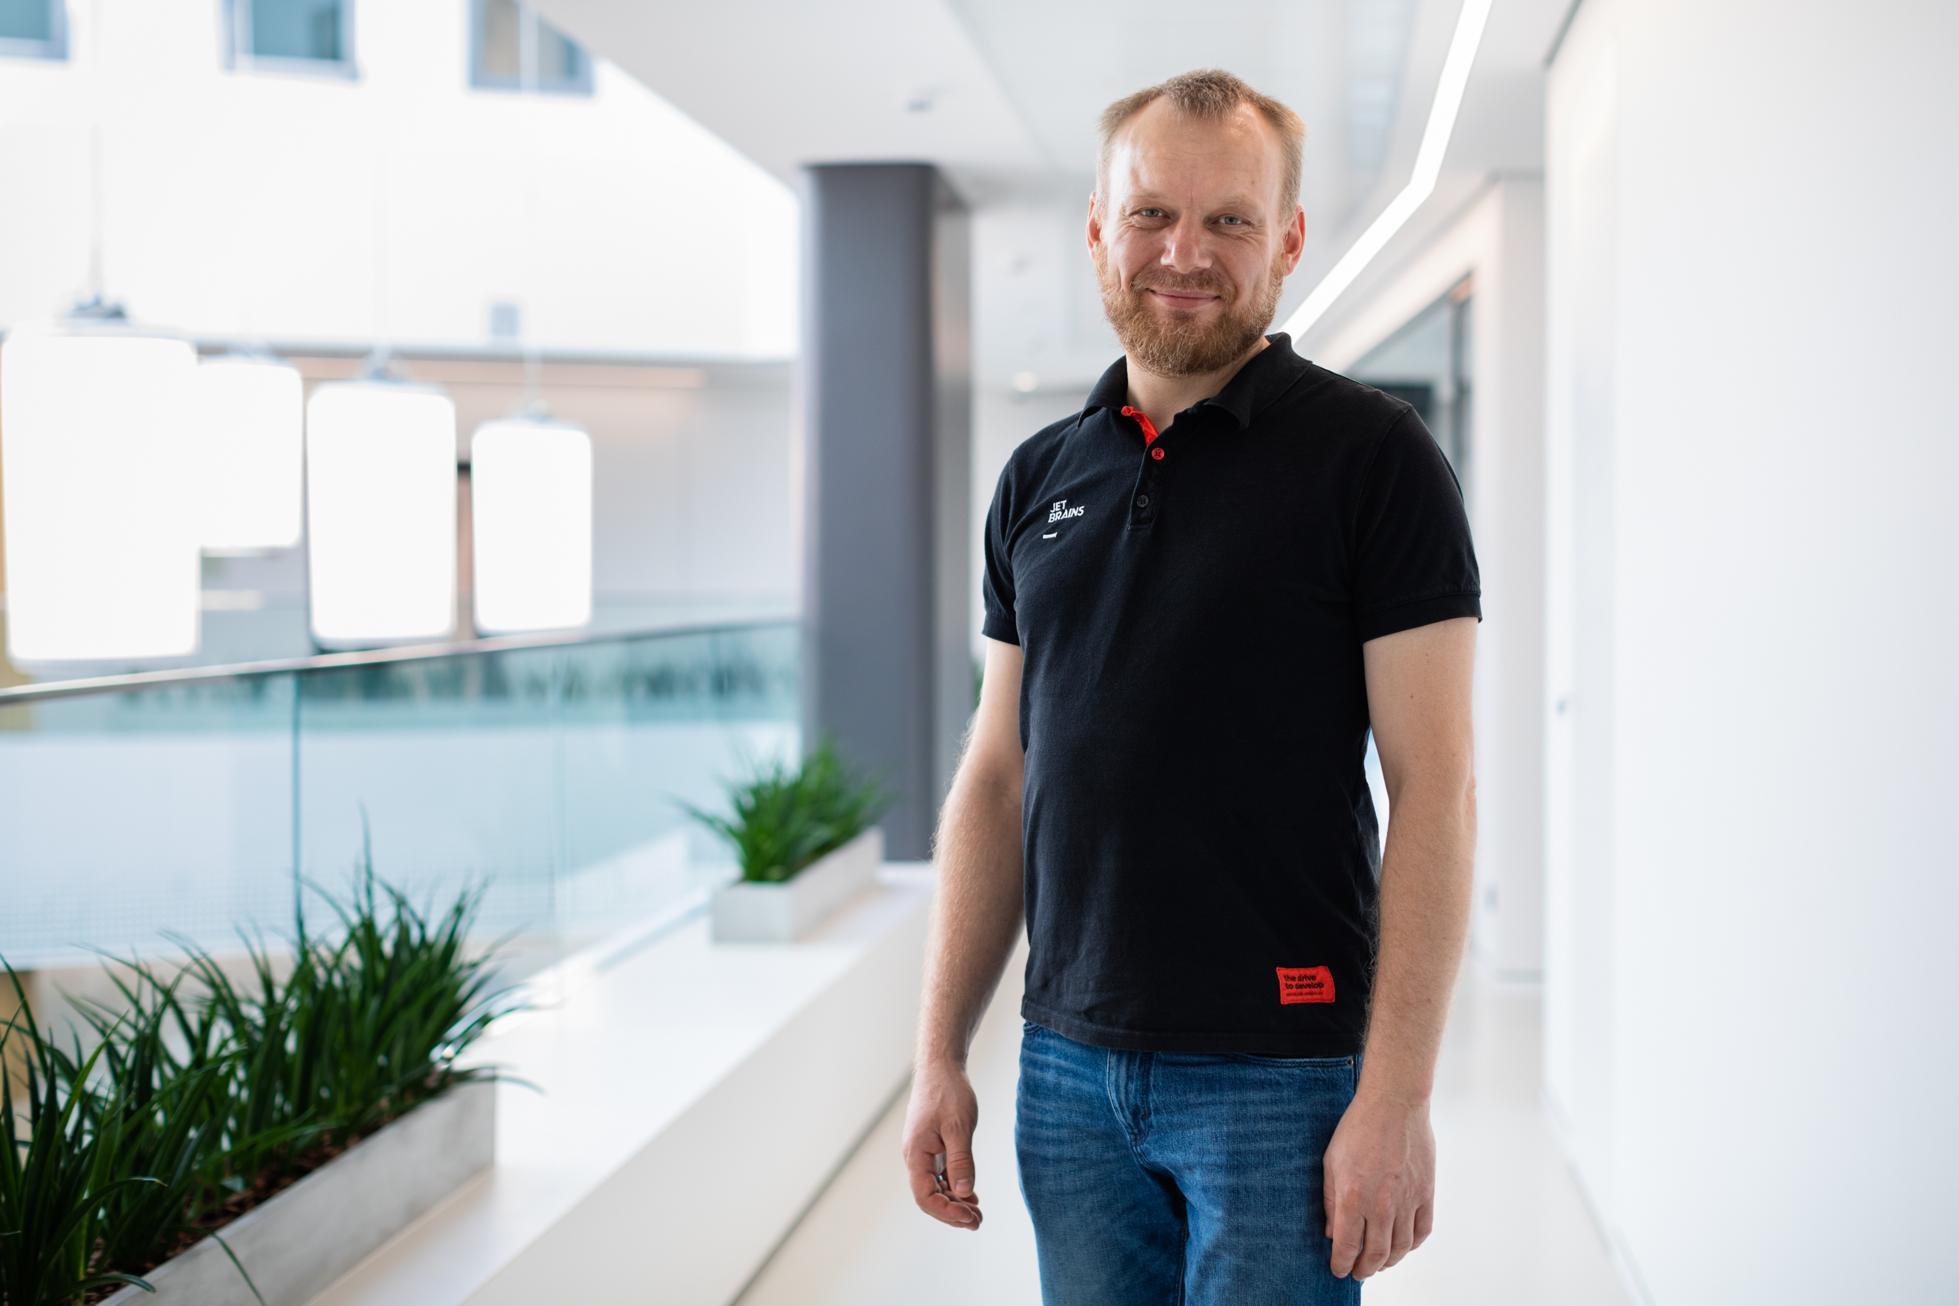 Maxim Shafirov, Managing Director of JetBrains, laments links to SolarWinds violations.